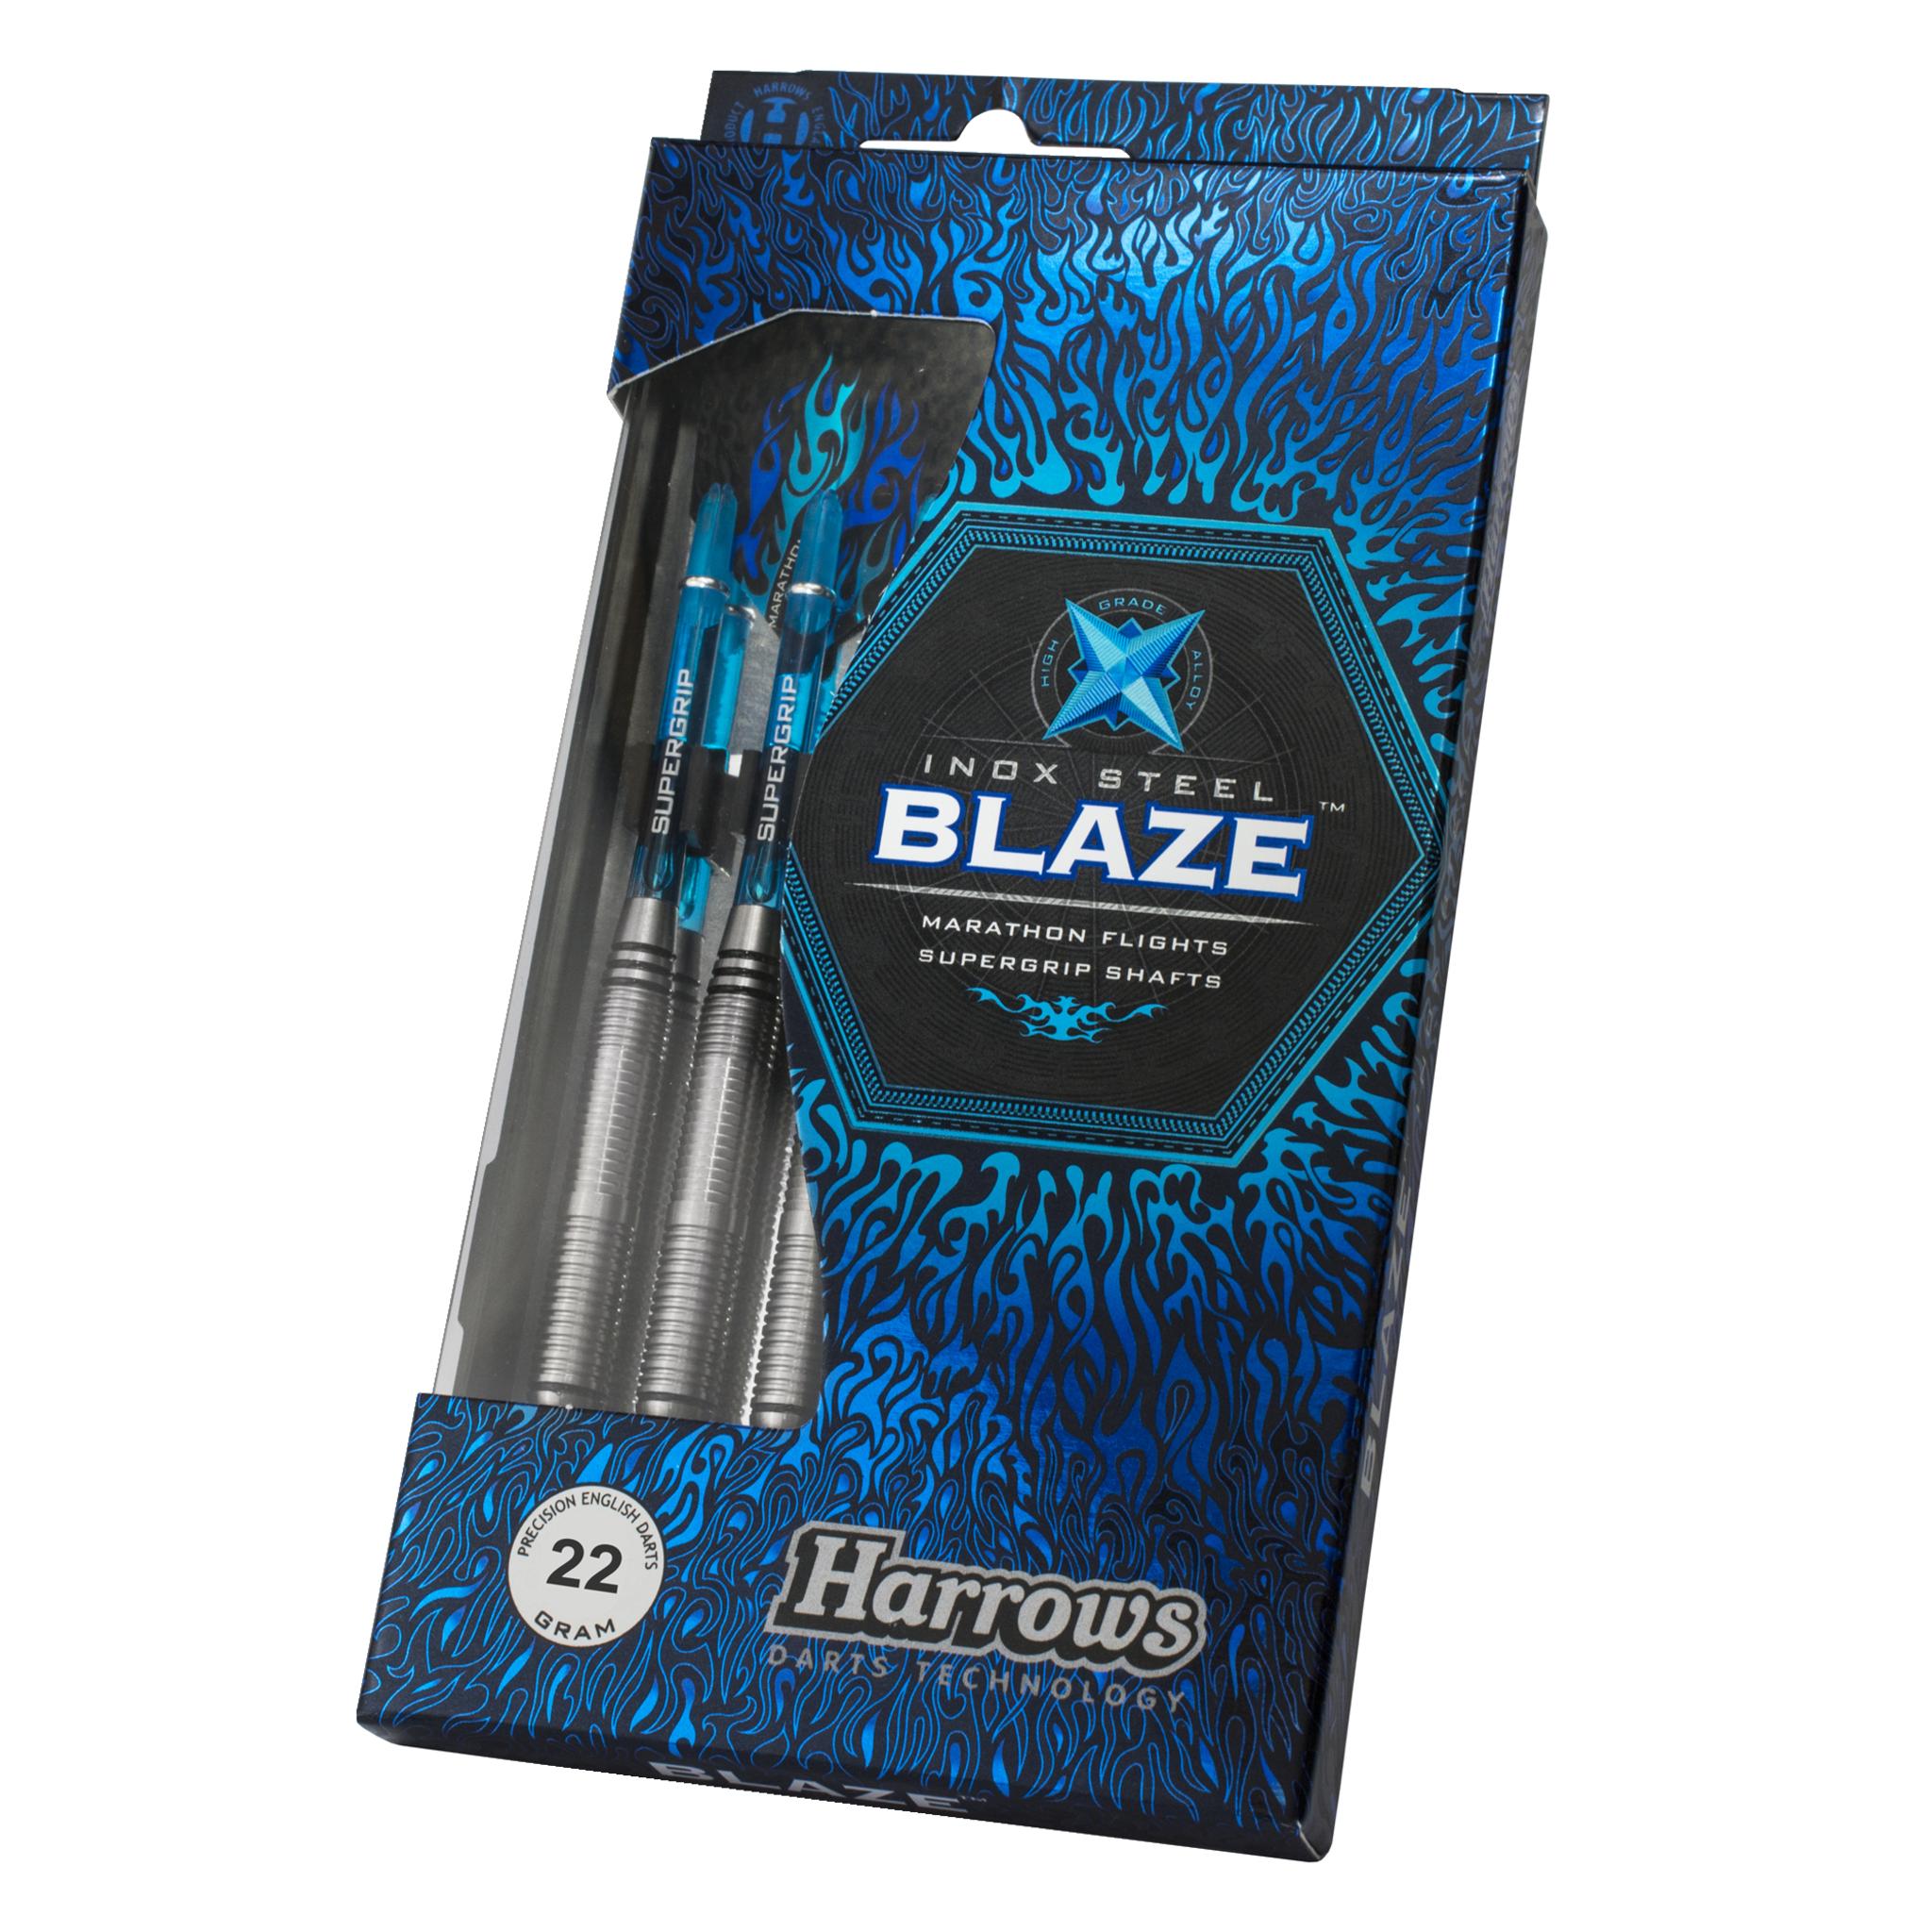 Harrows Blaze, dartpiler